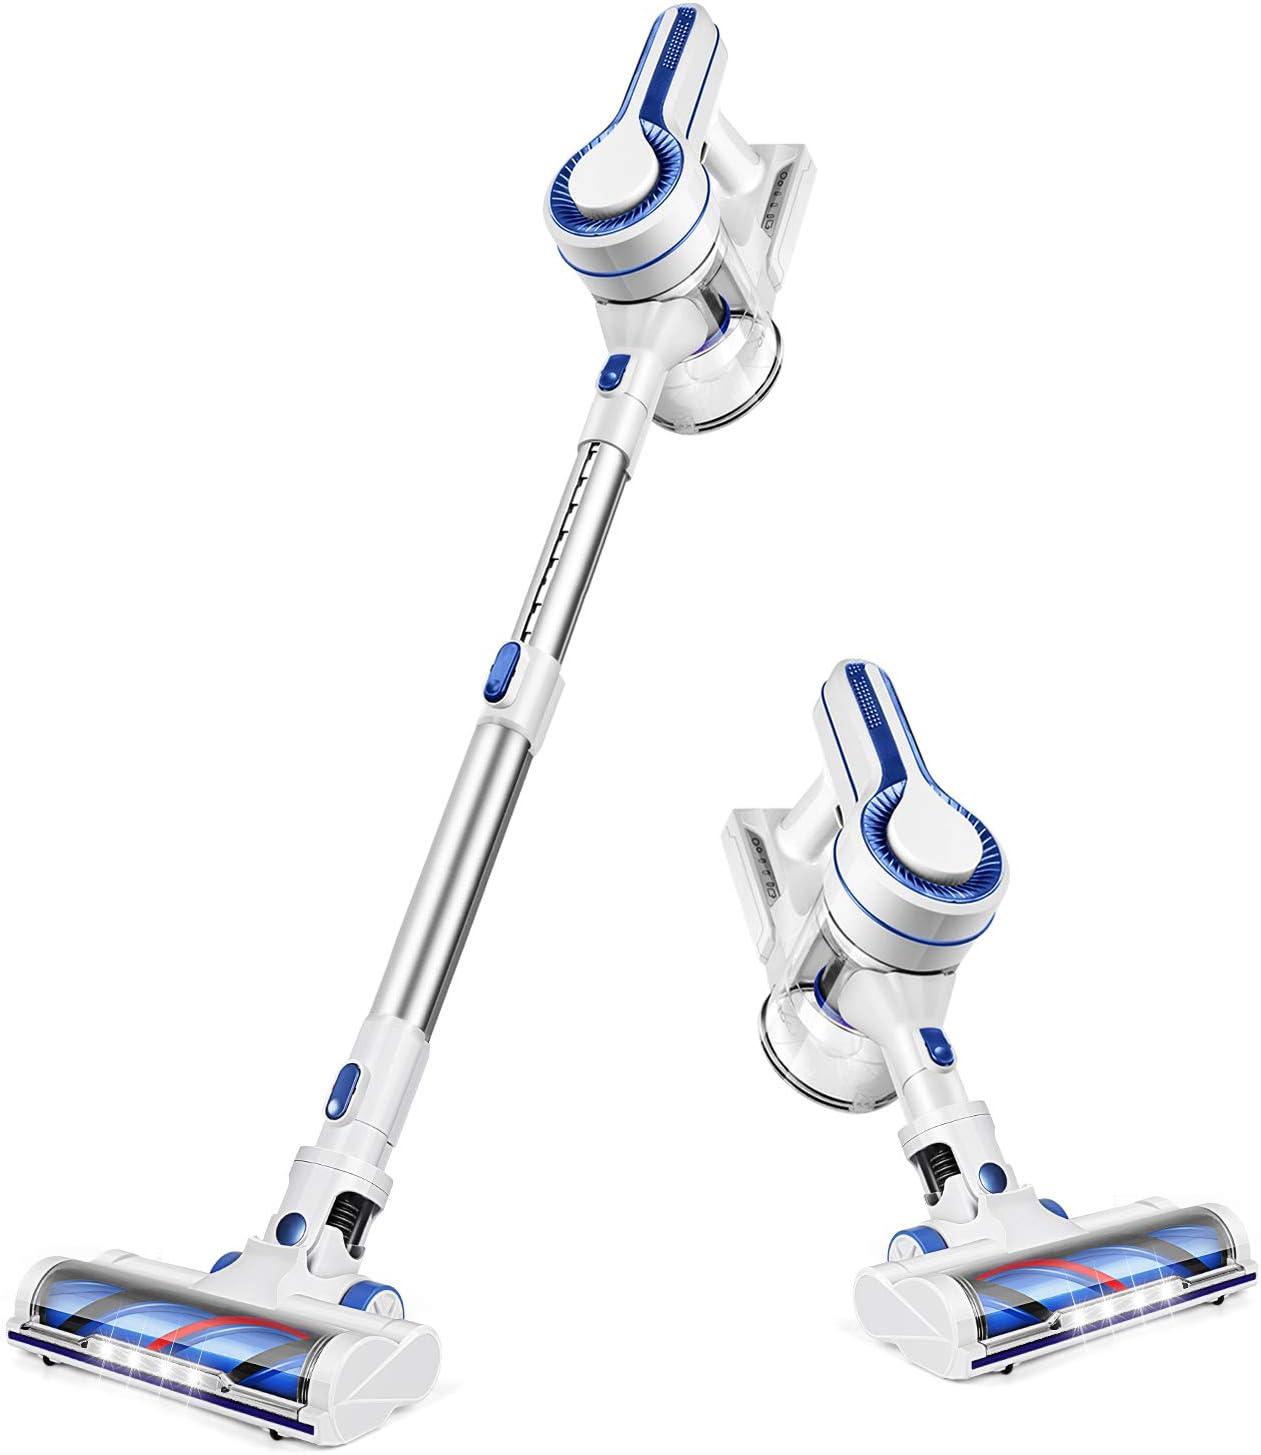 APOSEN Cordless Vacuum Cleaner 18KPa Powerful Suction 250W Brushless Motor 4 in 1 Stick Handheld Vacuum for Home Hard Floor Carpet Car Pet H250 (White)